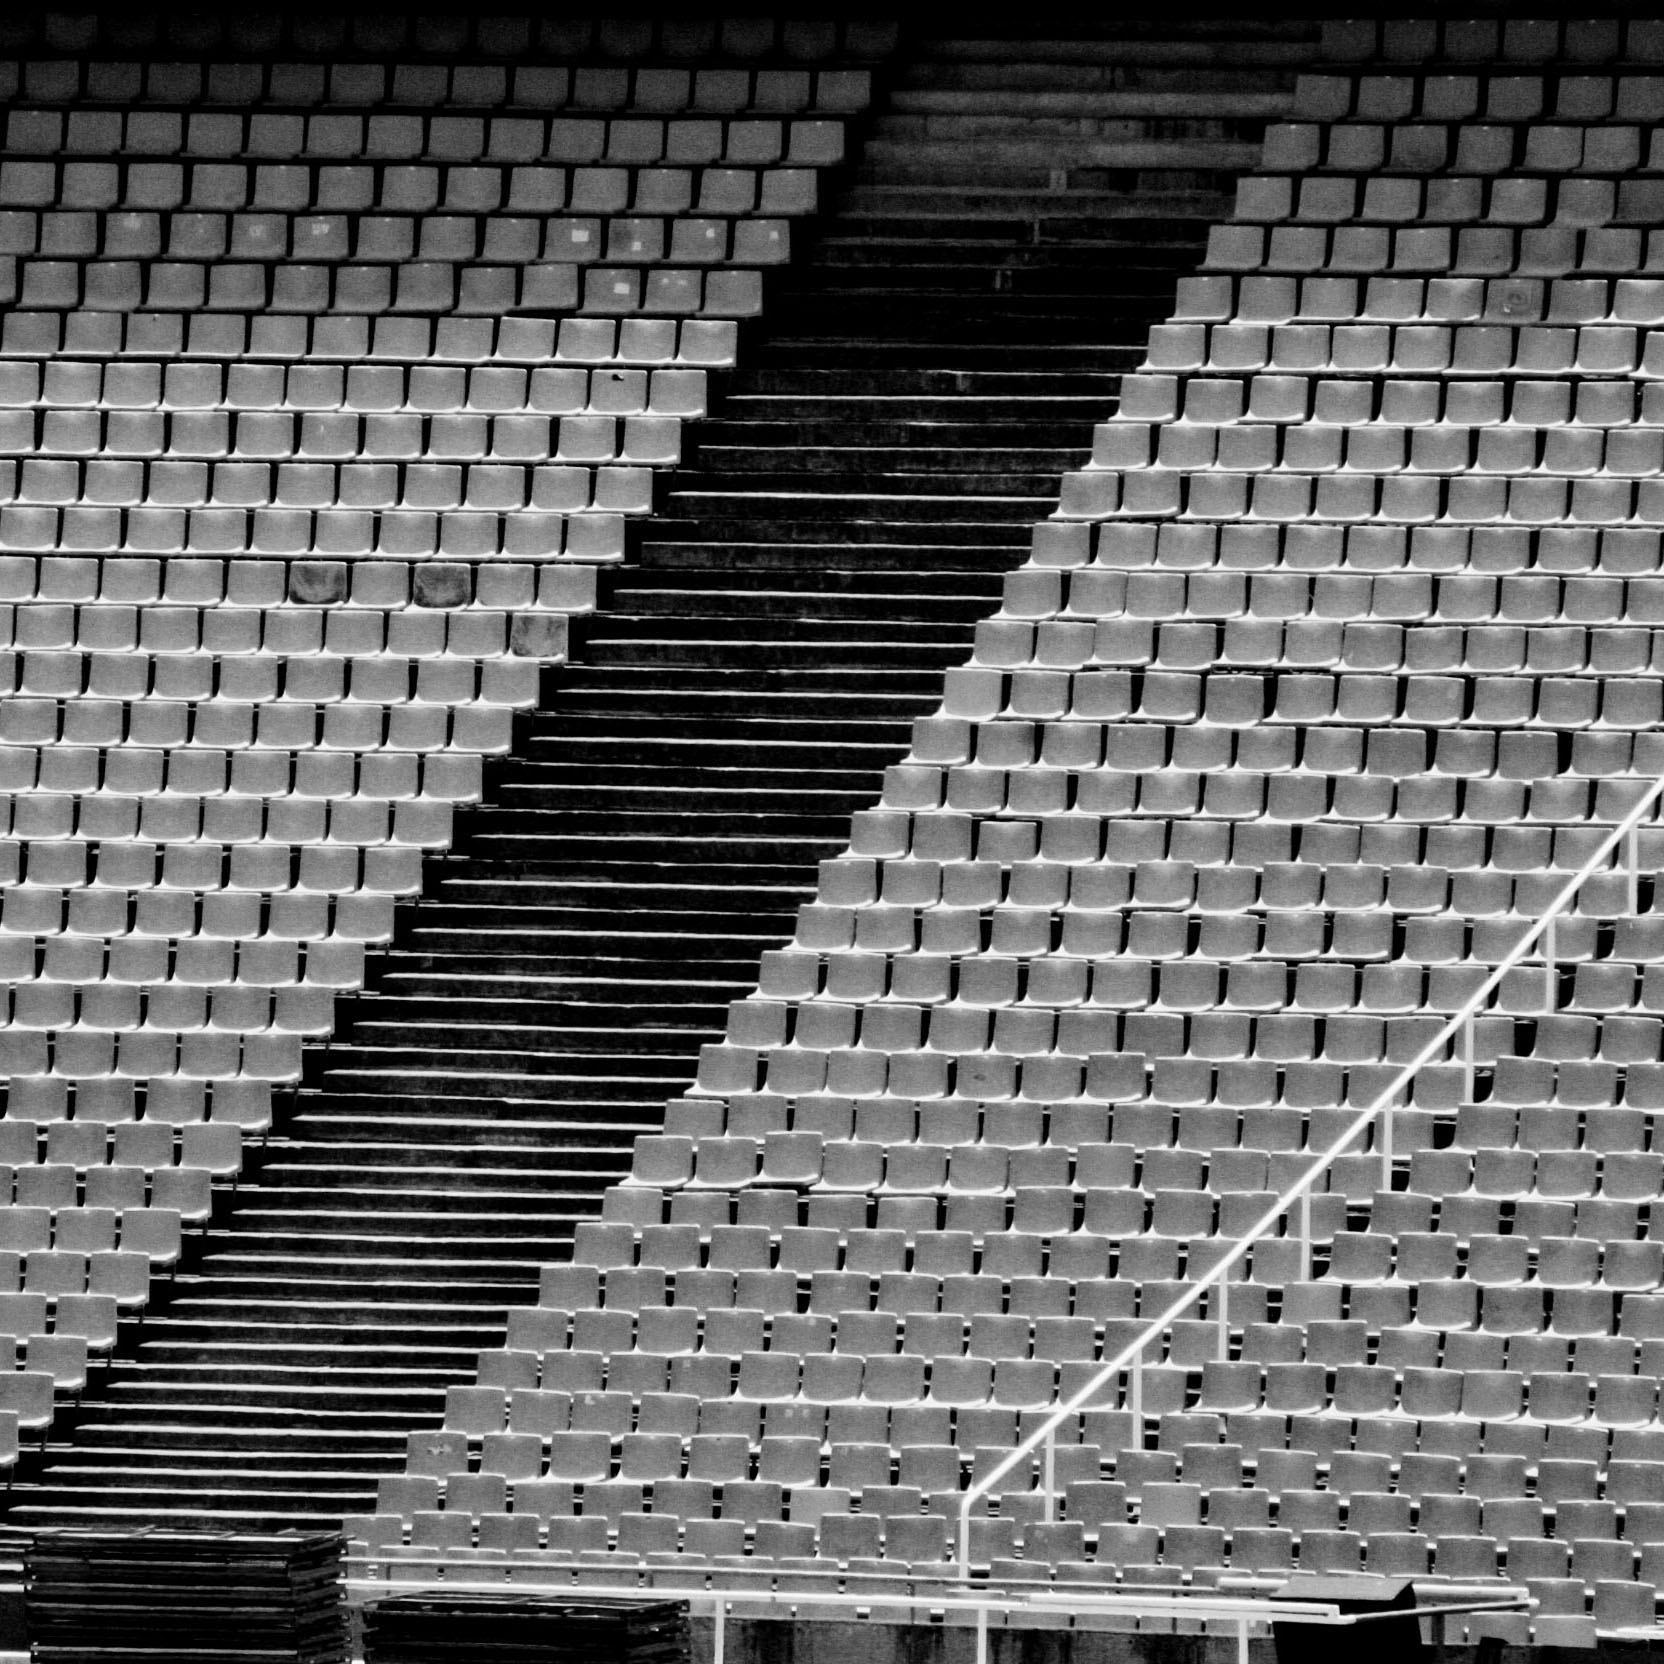 Stadion 2 (Foto: Lena Sudmann)